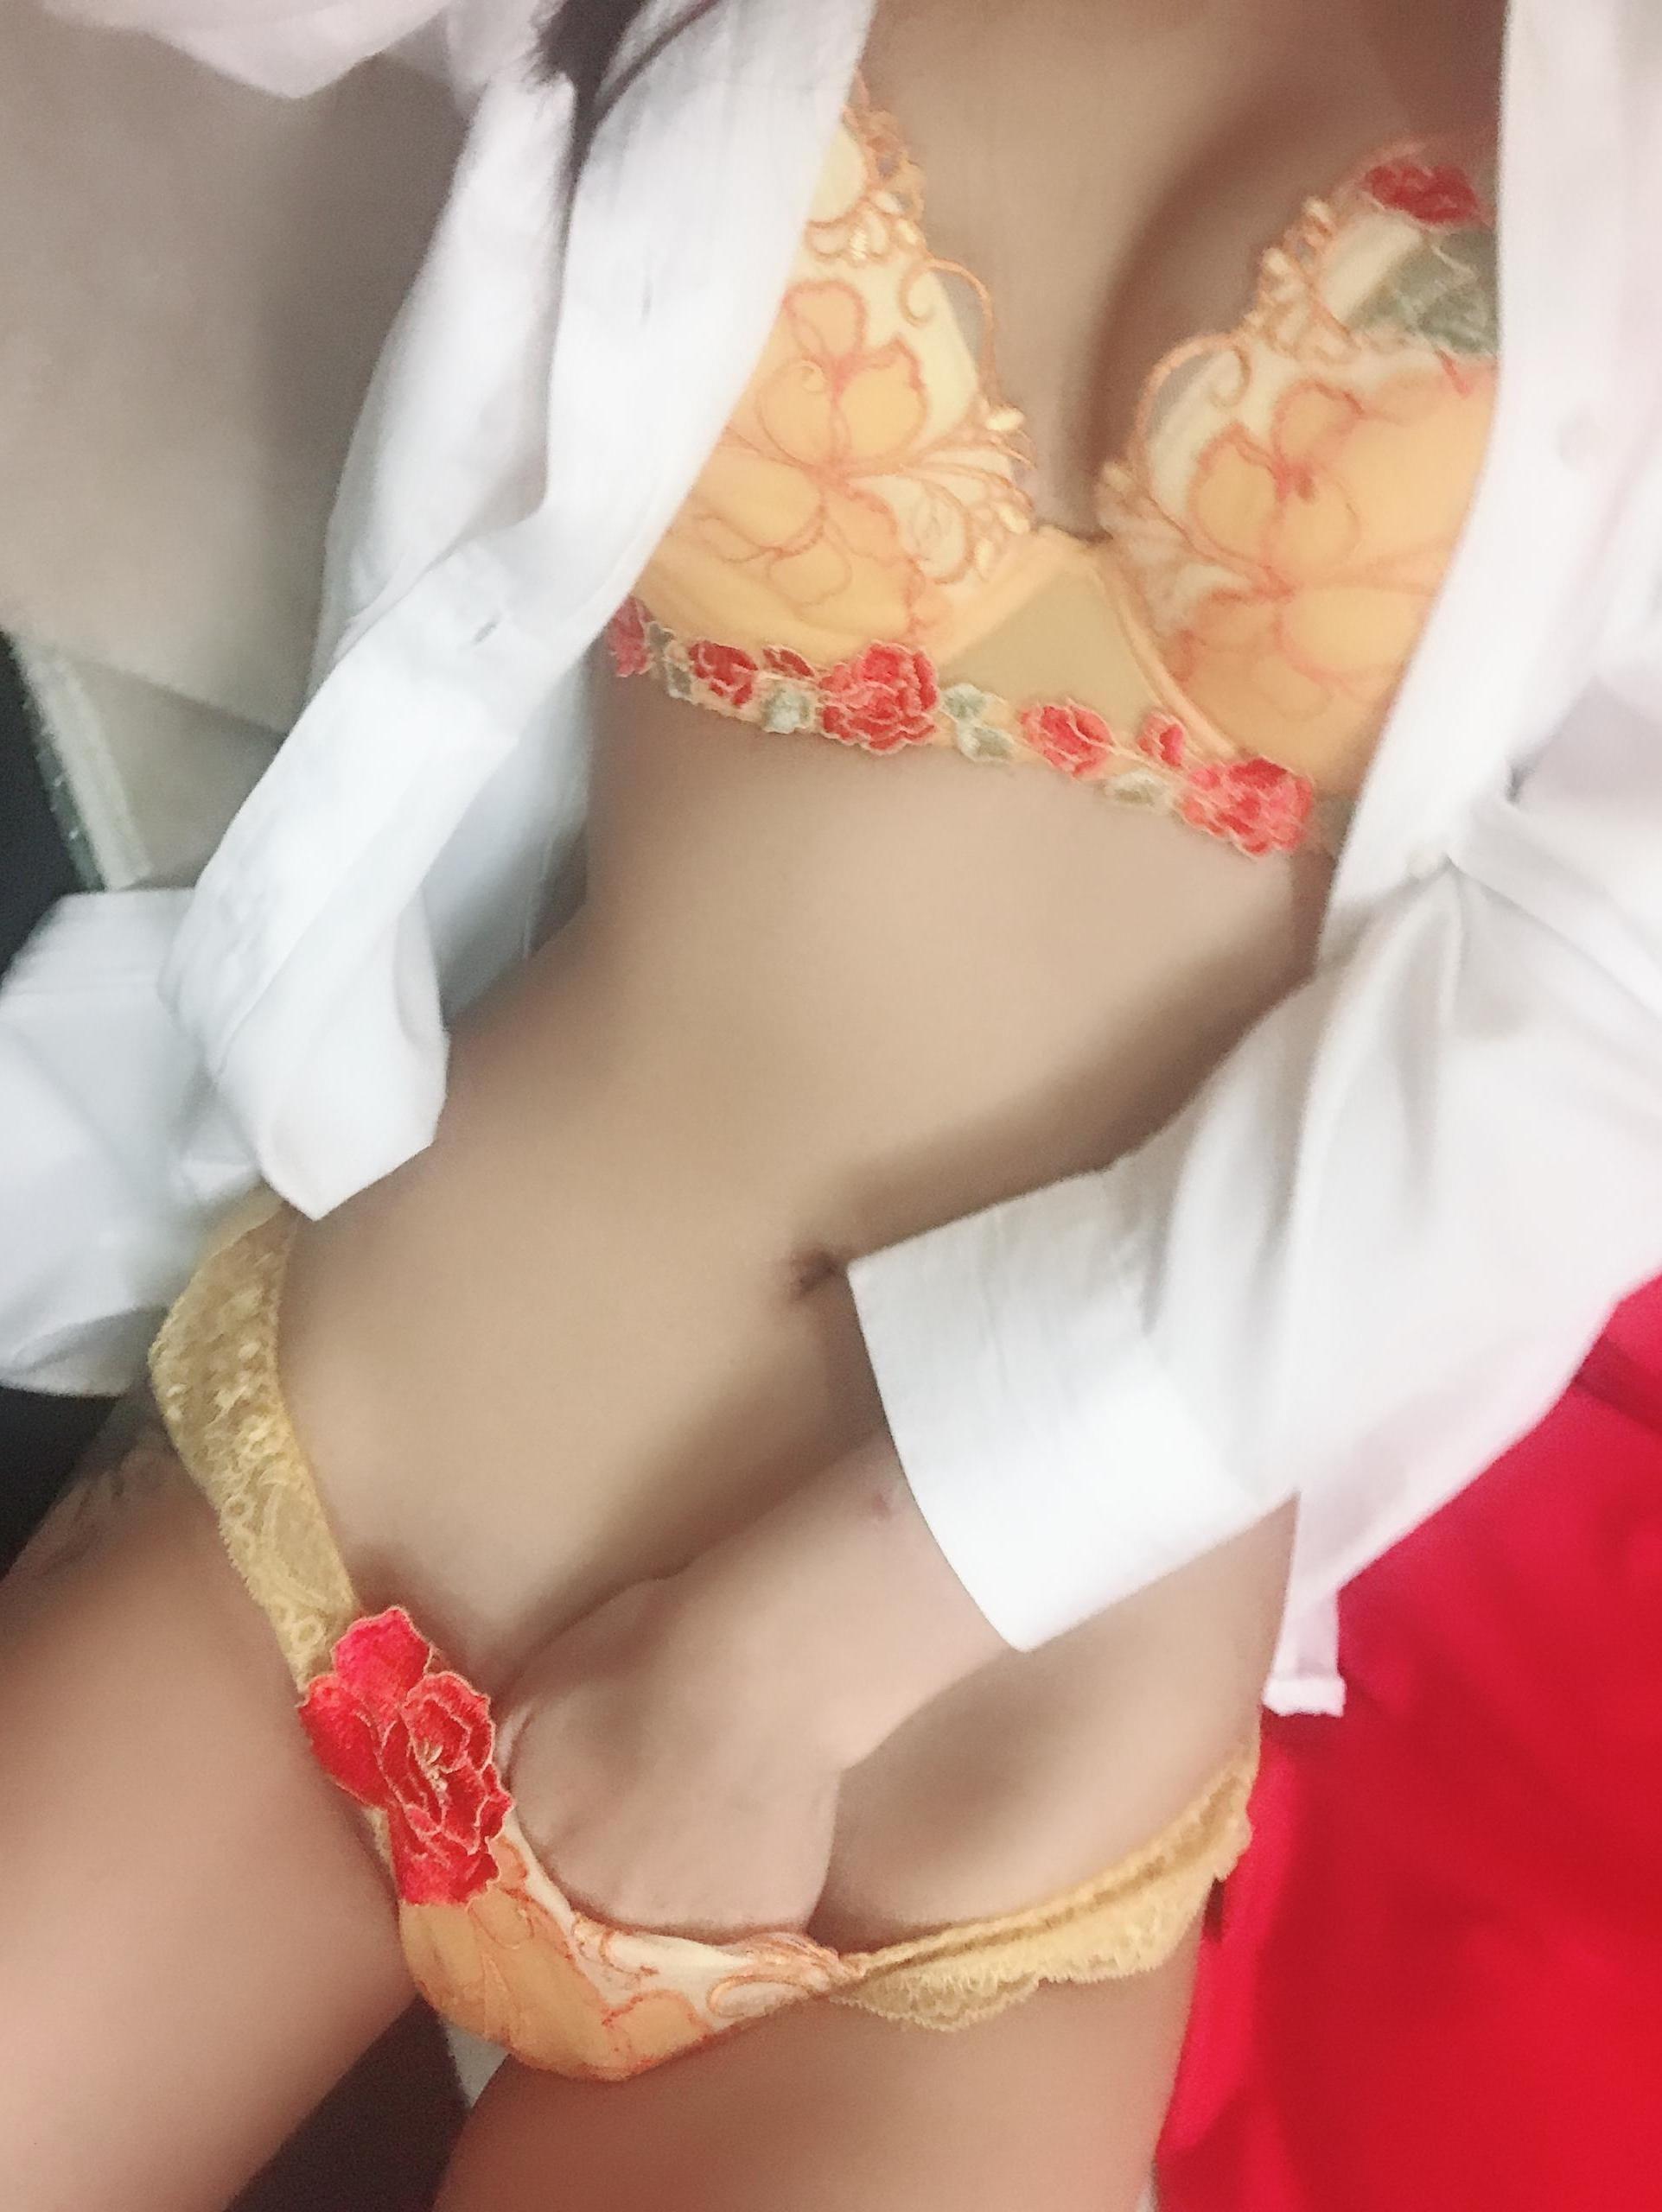 「No78 椎名」10/10(水) 19:08 | 椎名の写メ・風俗動画